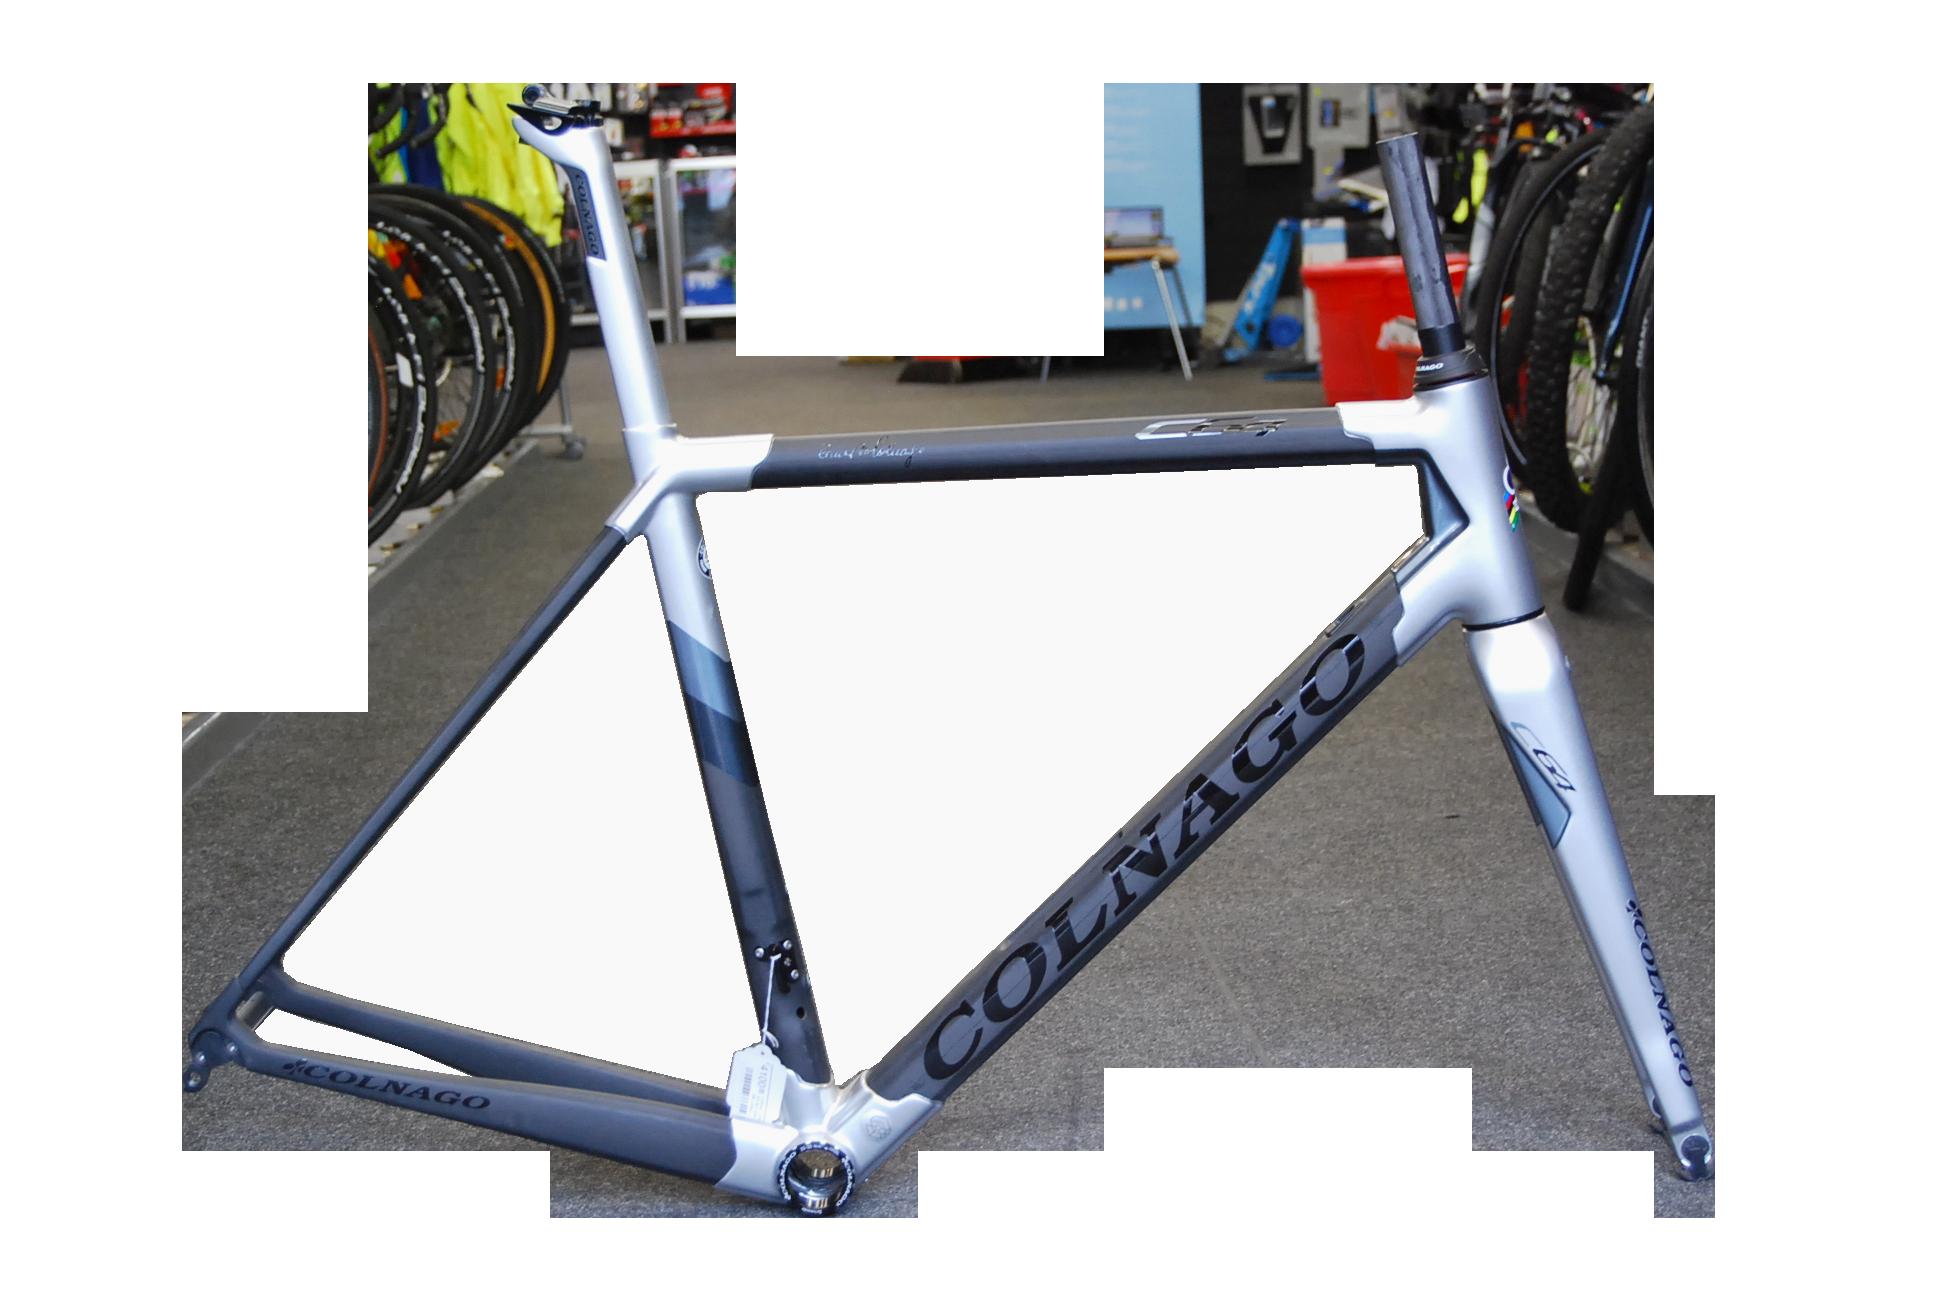 Colnago Colnago C 64 / 52s light grey lugs Blk Carbon